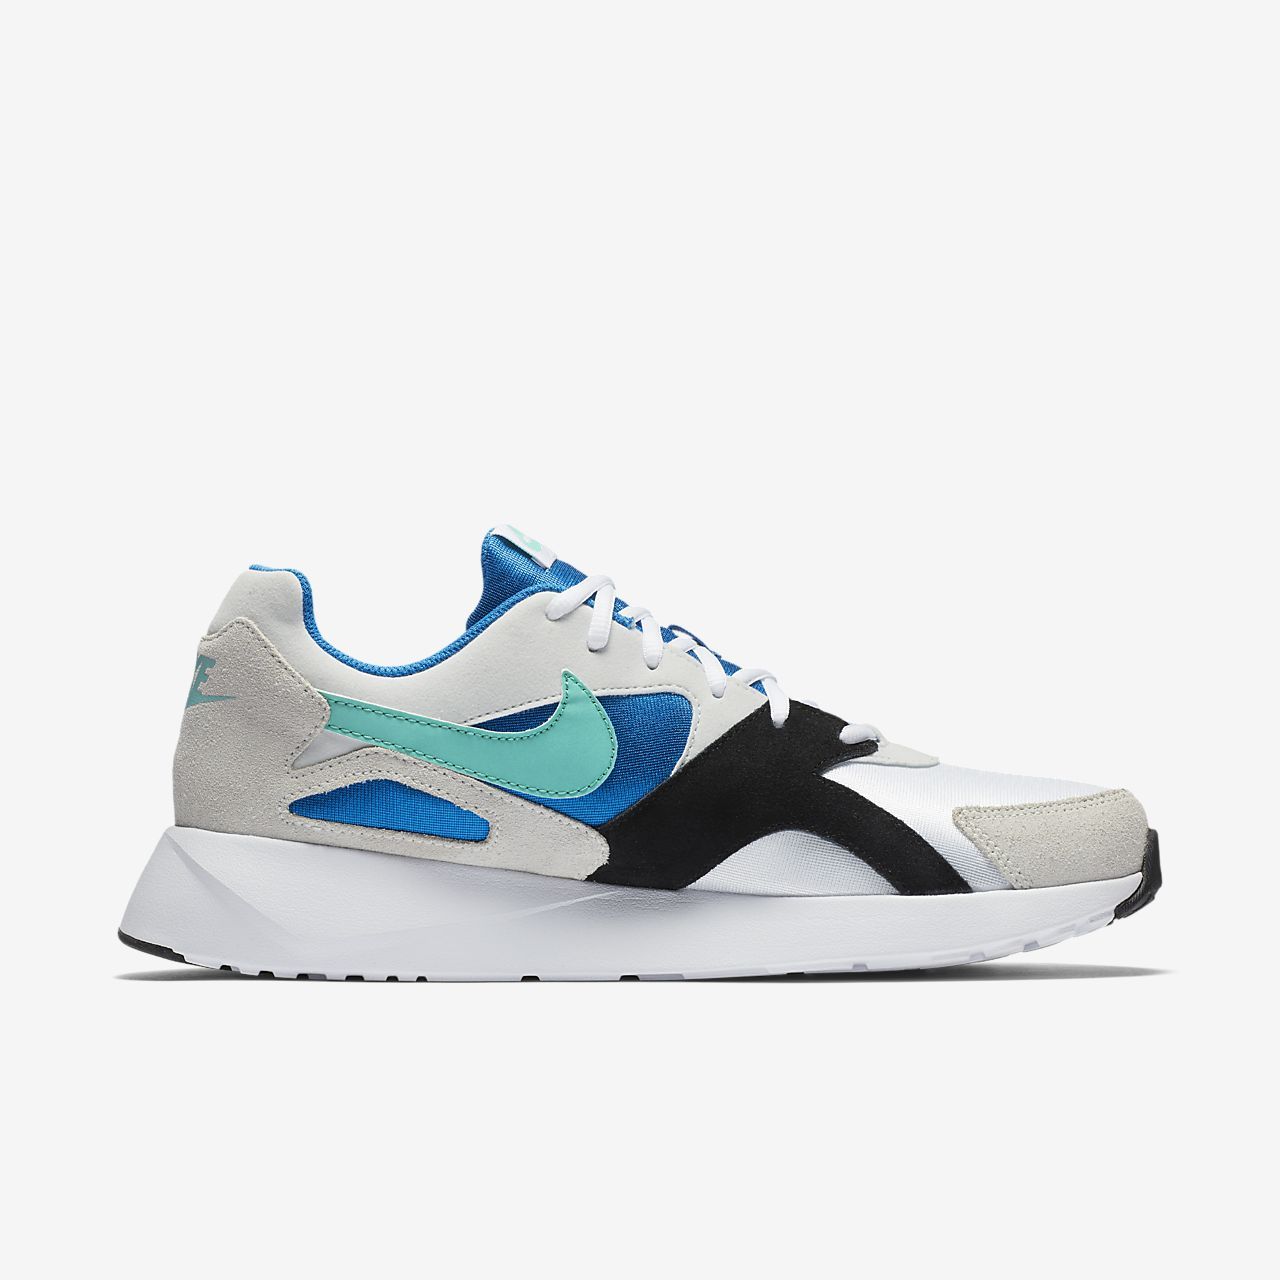 Nike Pantheos Férfi Cipő Akciók, Nike Férfi Sportcipő